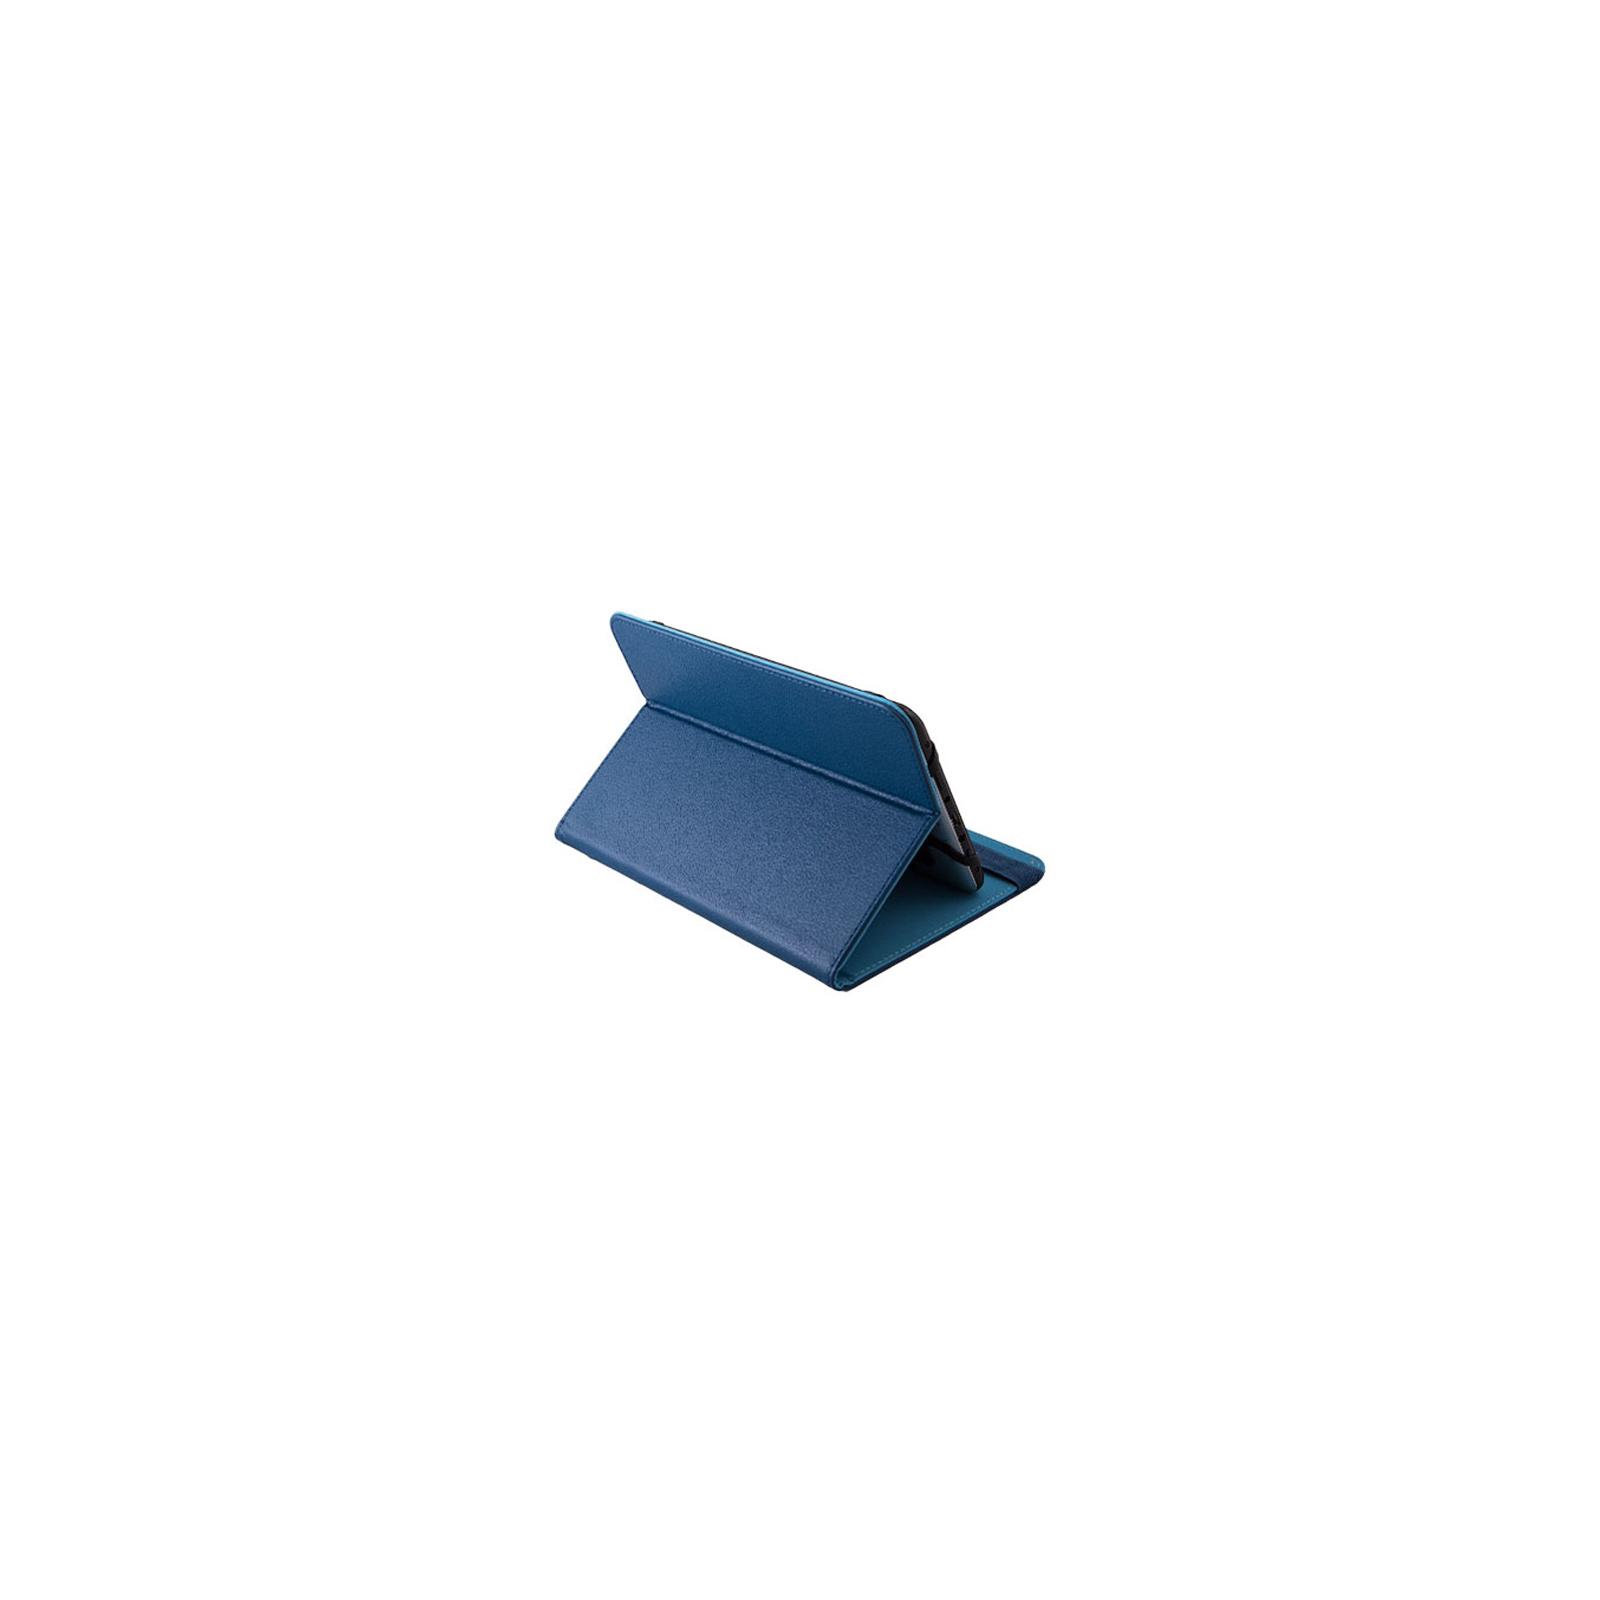 "Чехол для планшета Vellini 7"" Universal stand Dark Blue (216877) изображение 4"